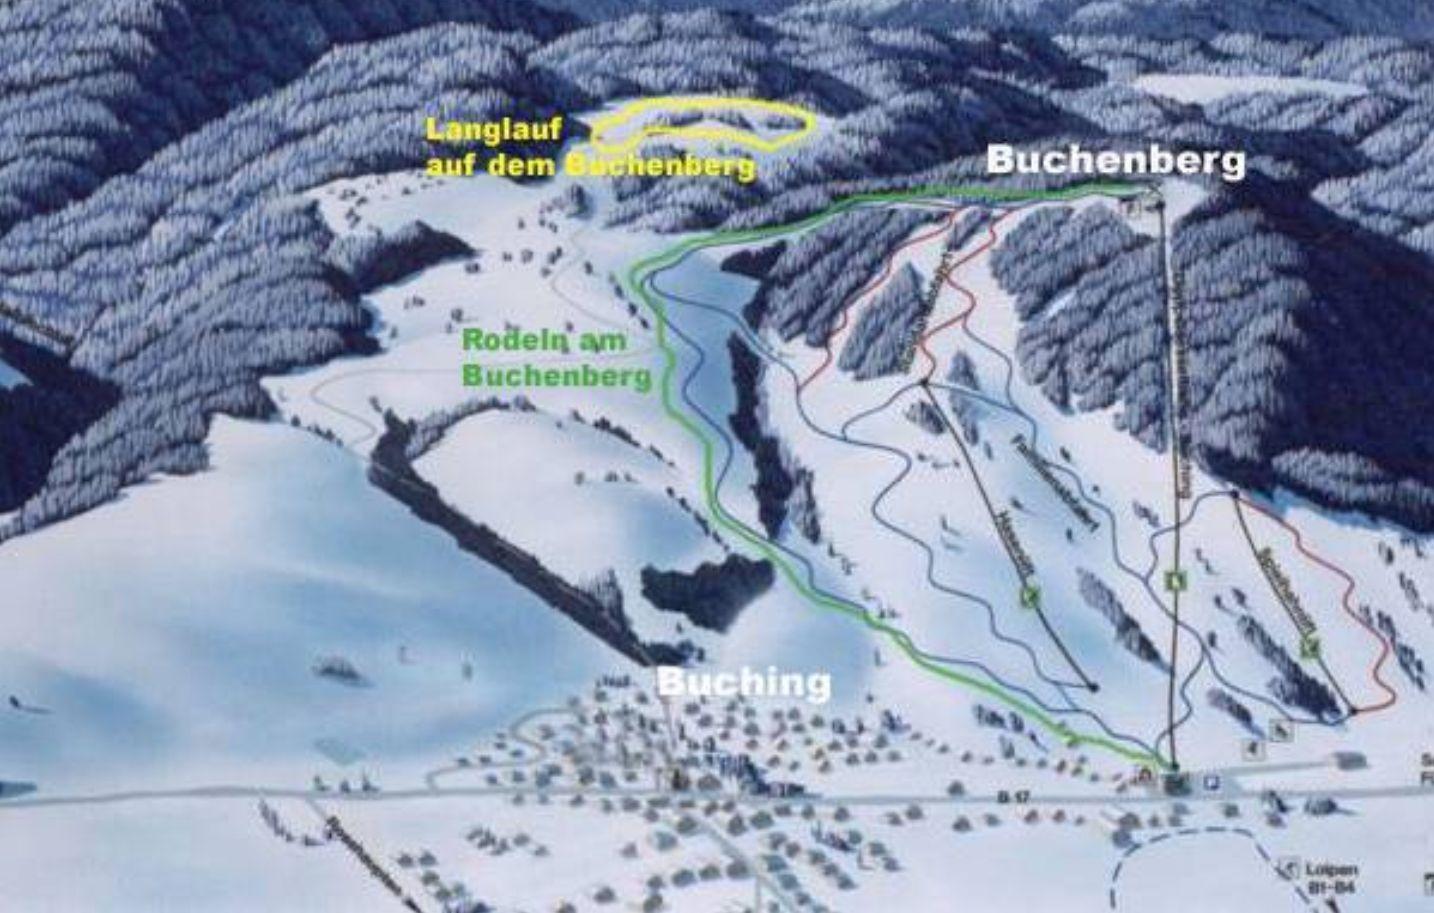 Buchenberg - Buching